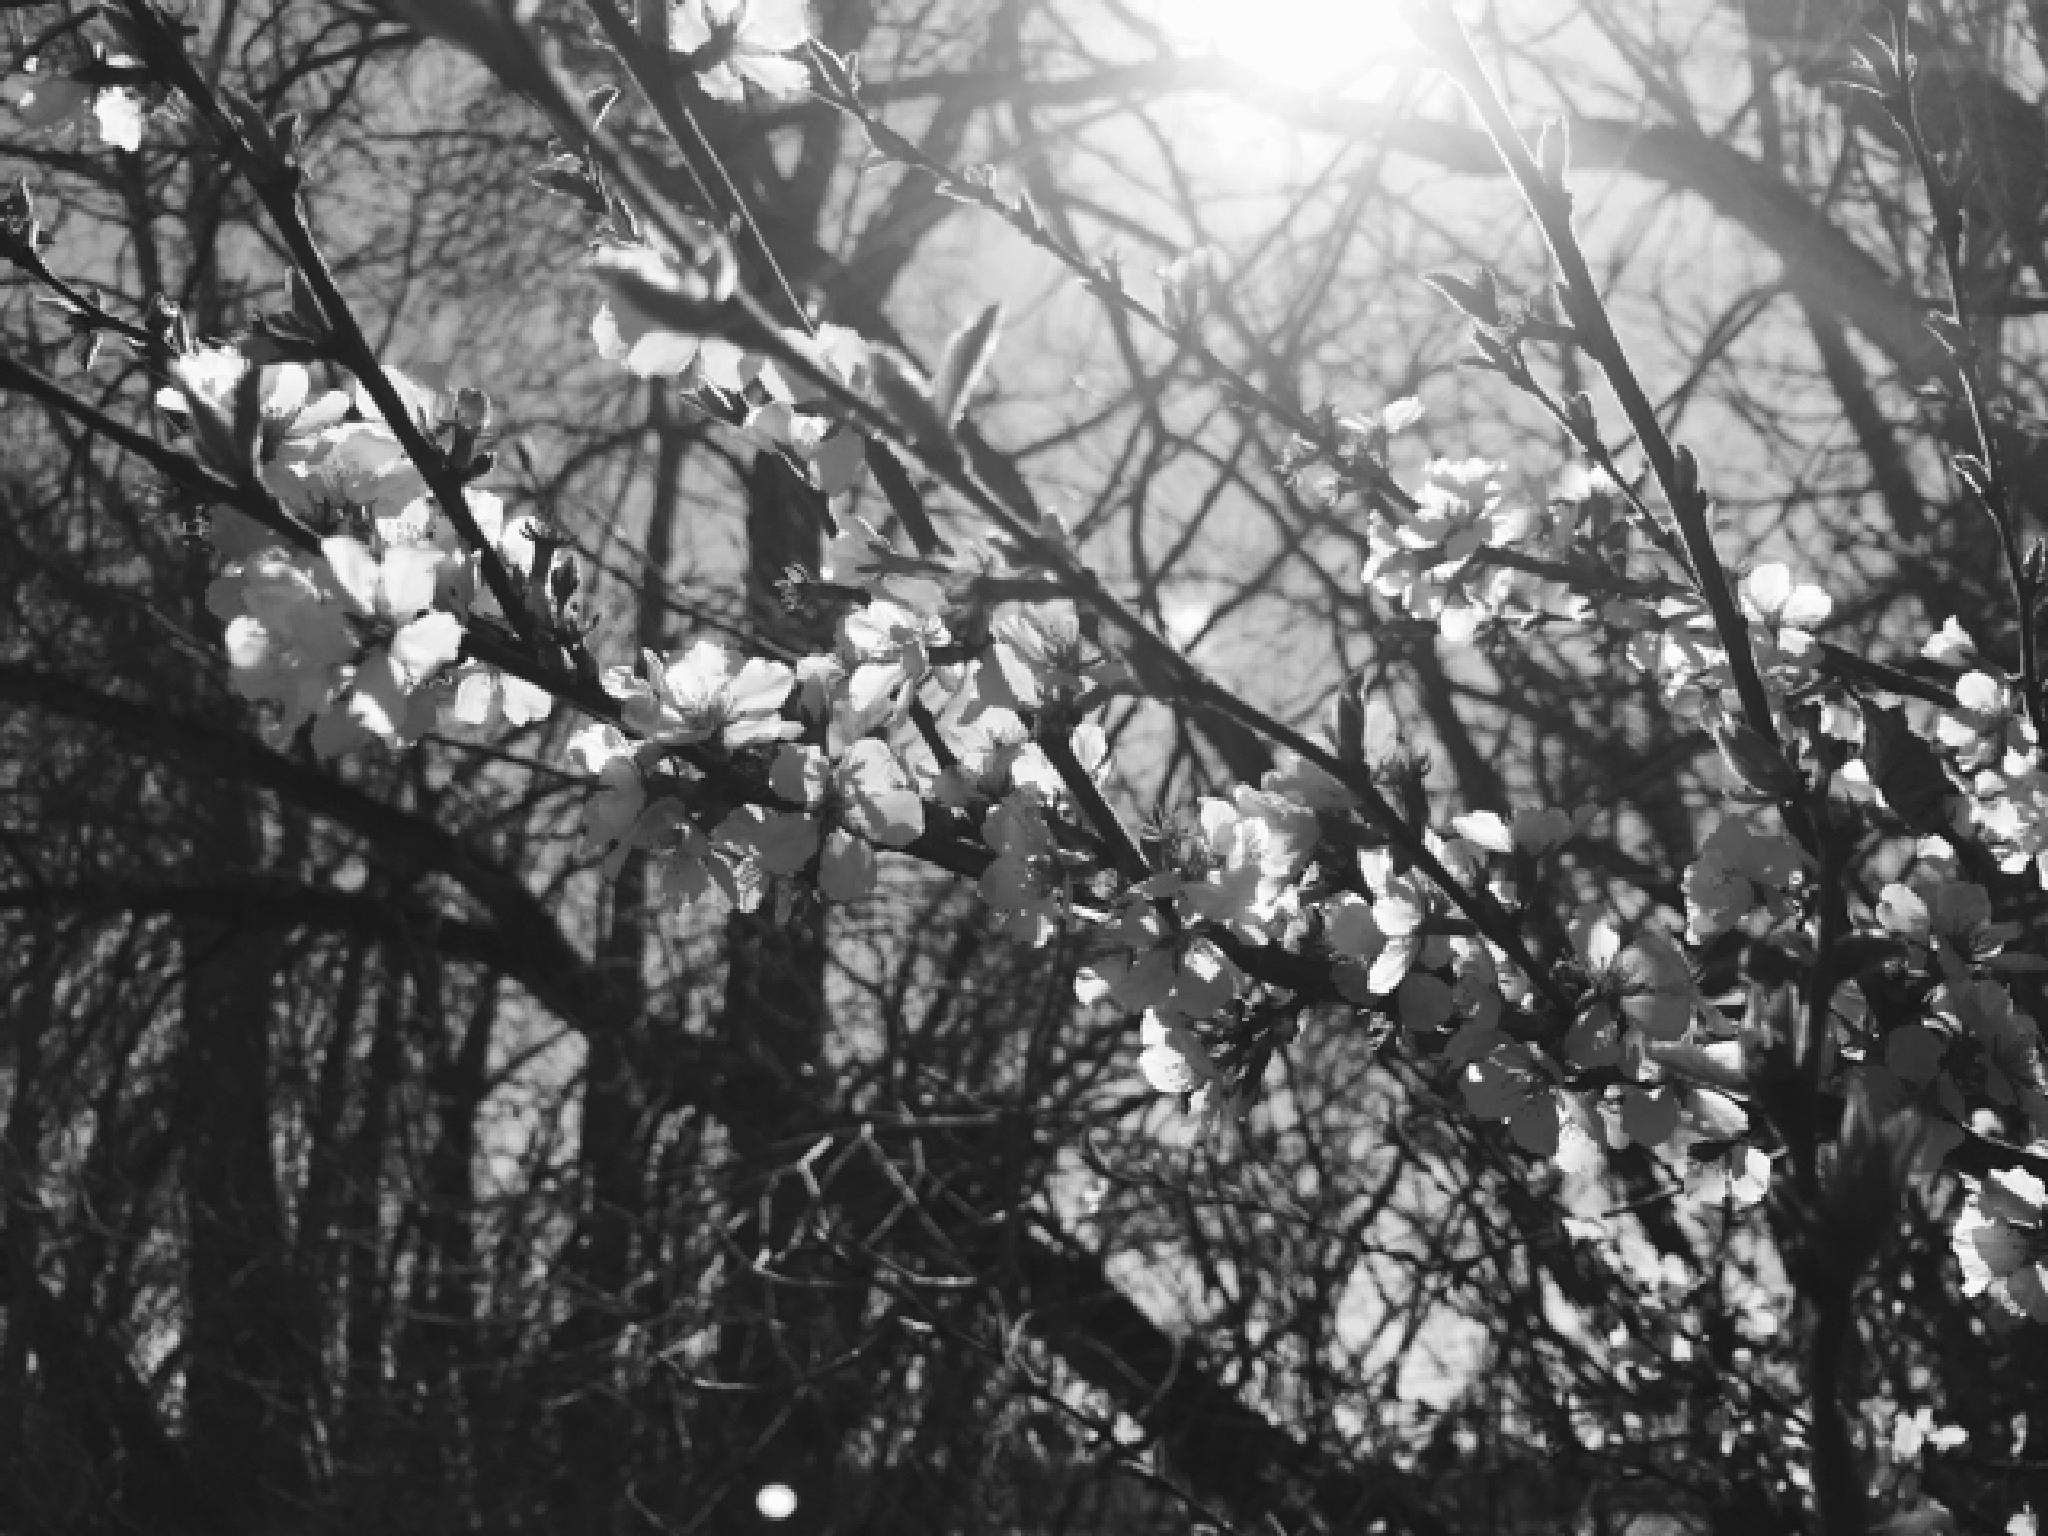 Crabapple Blossoms by rhonda.broich